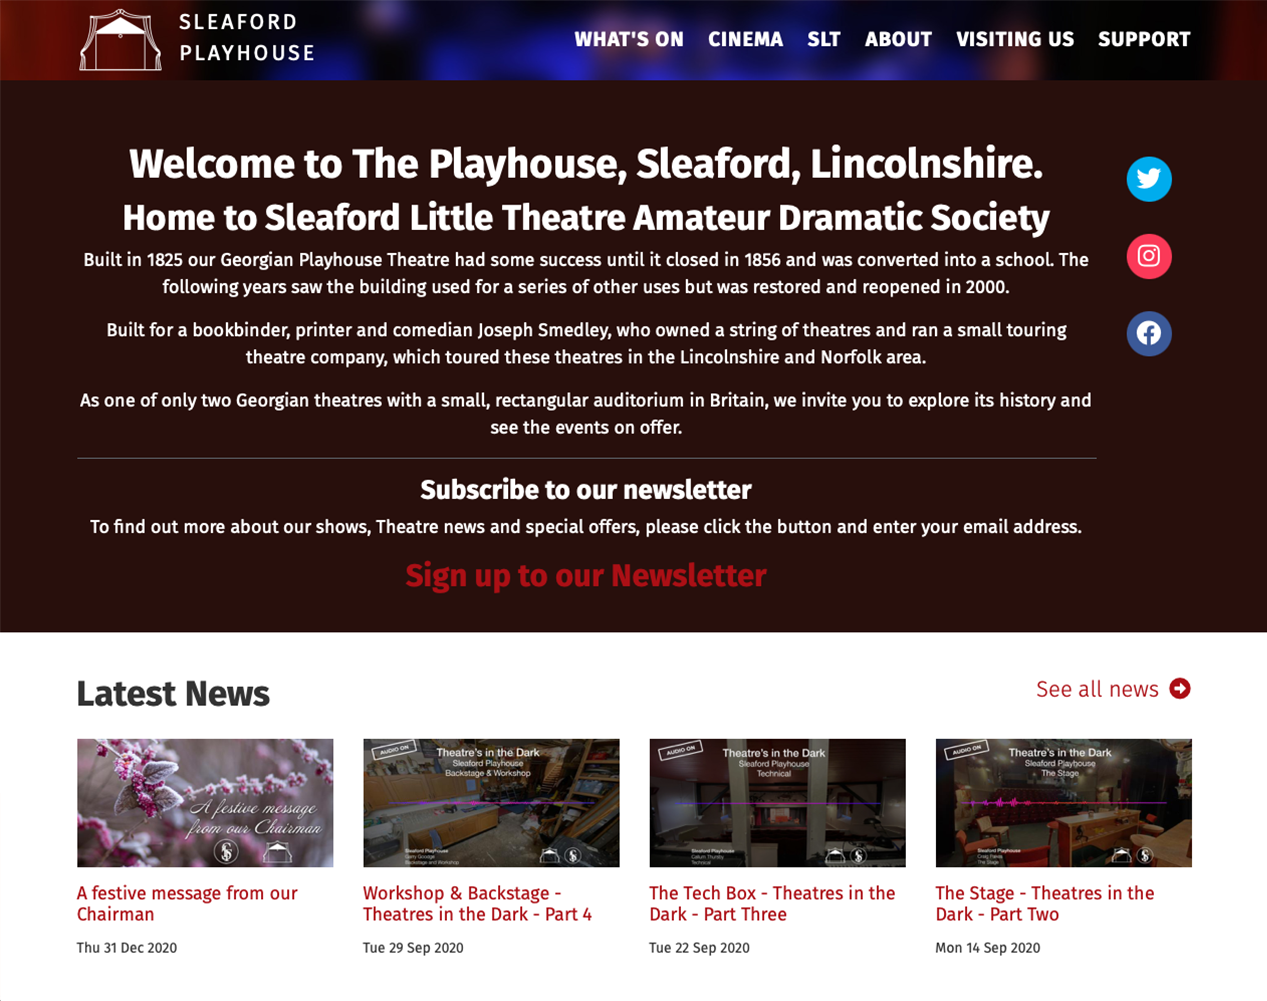 Sleaford Playhouse